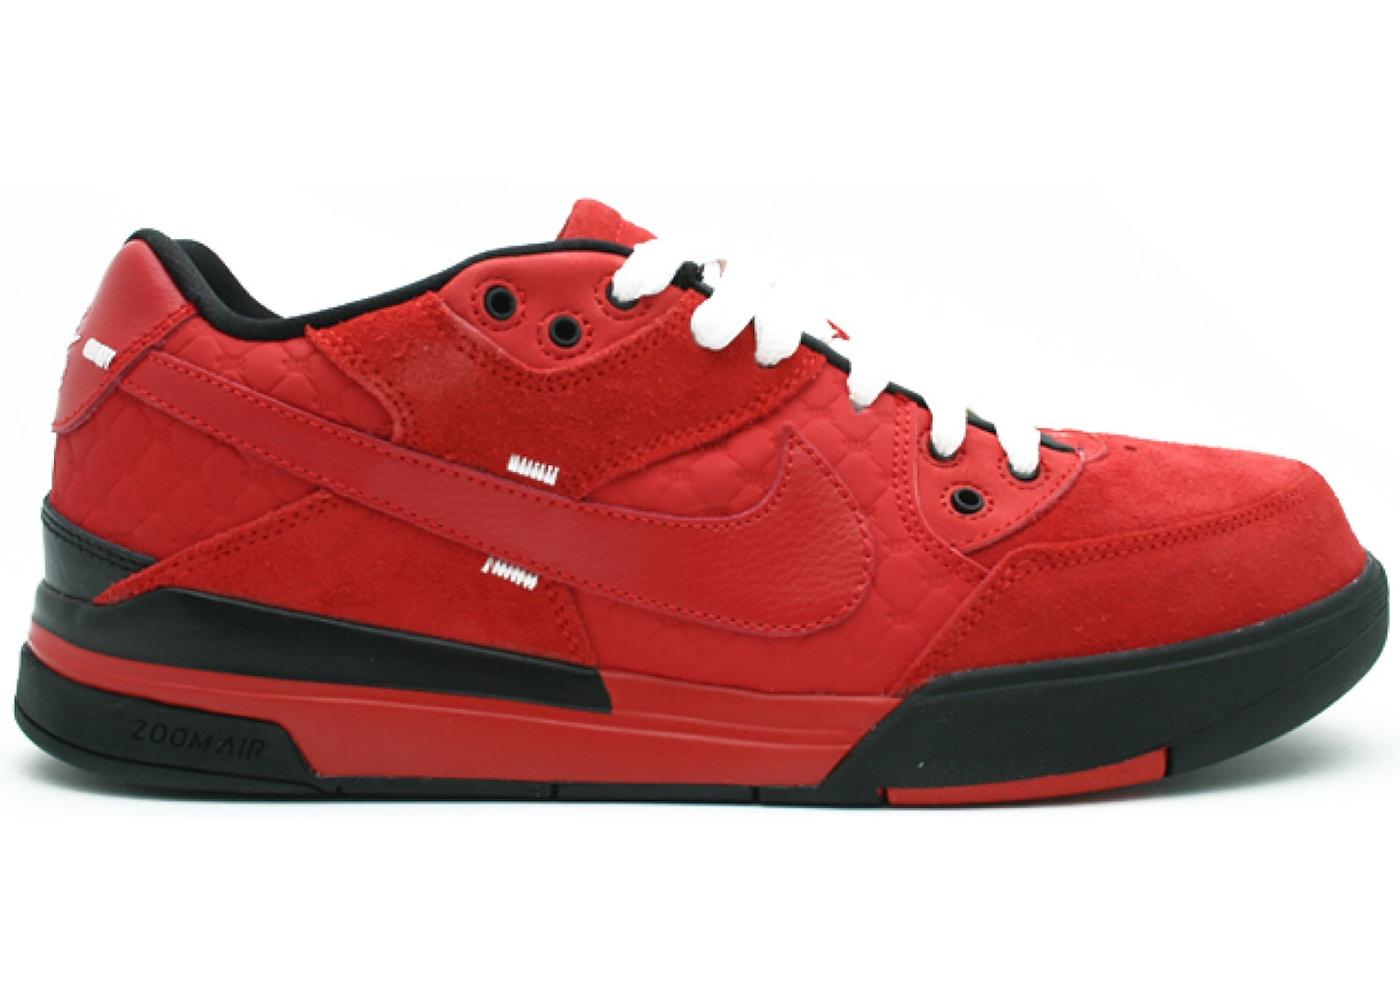 vittime Strano Avanzare  Nike SB Zoom Paul Rodriguez 3 Sport Red - 366620-661